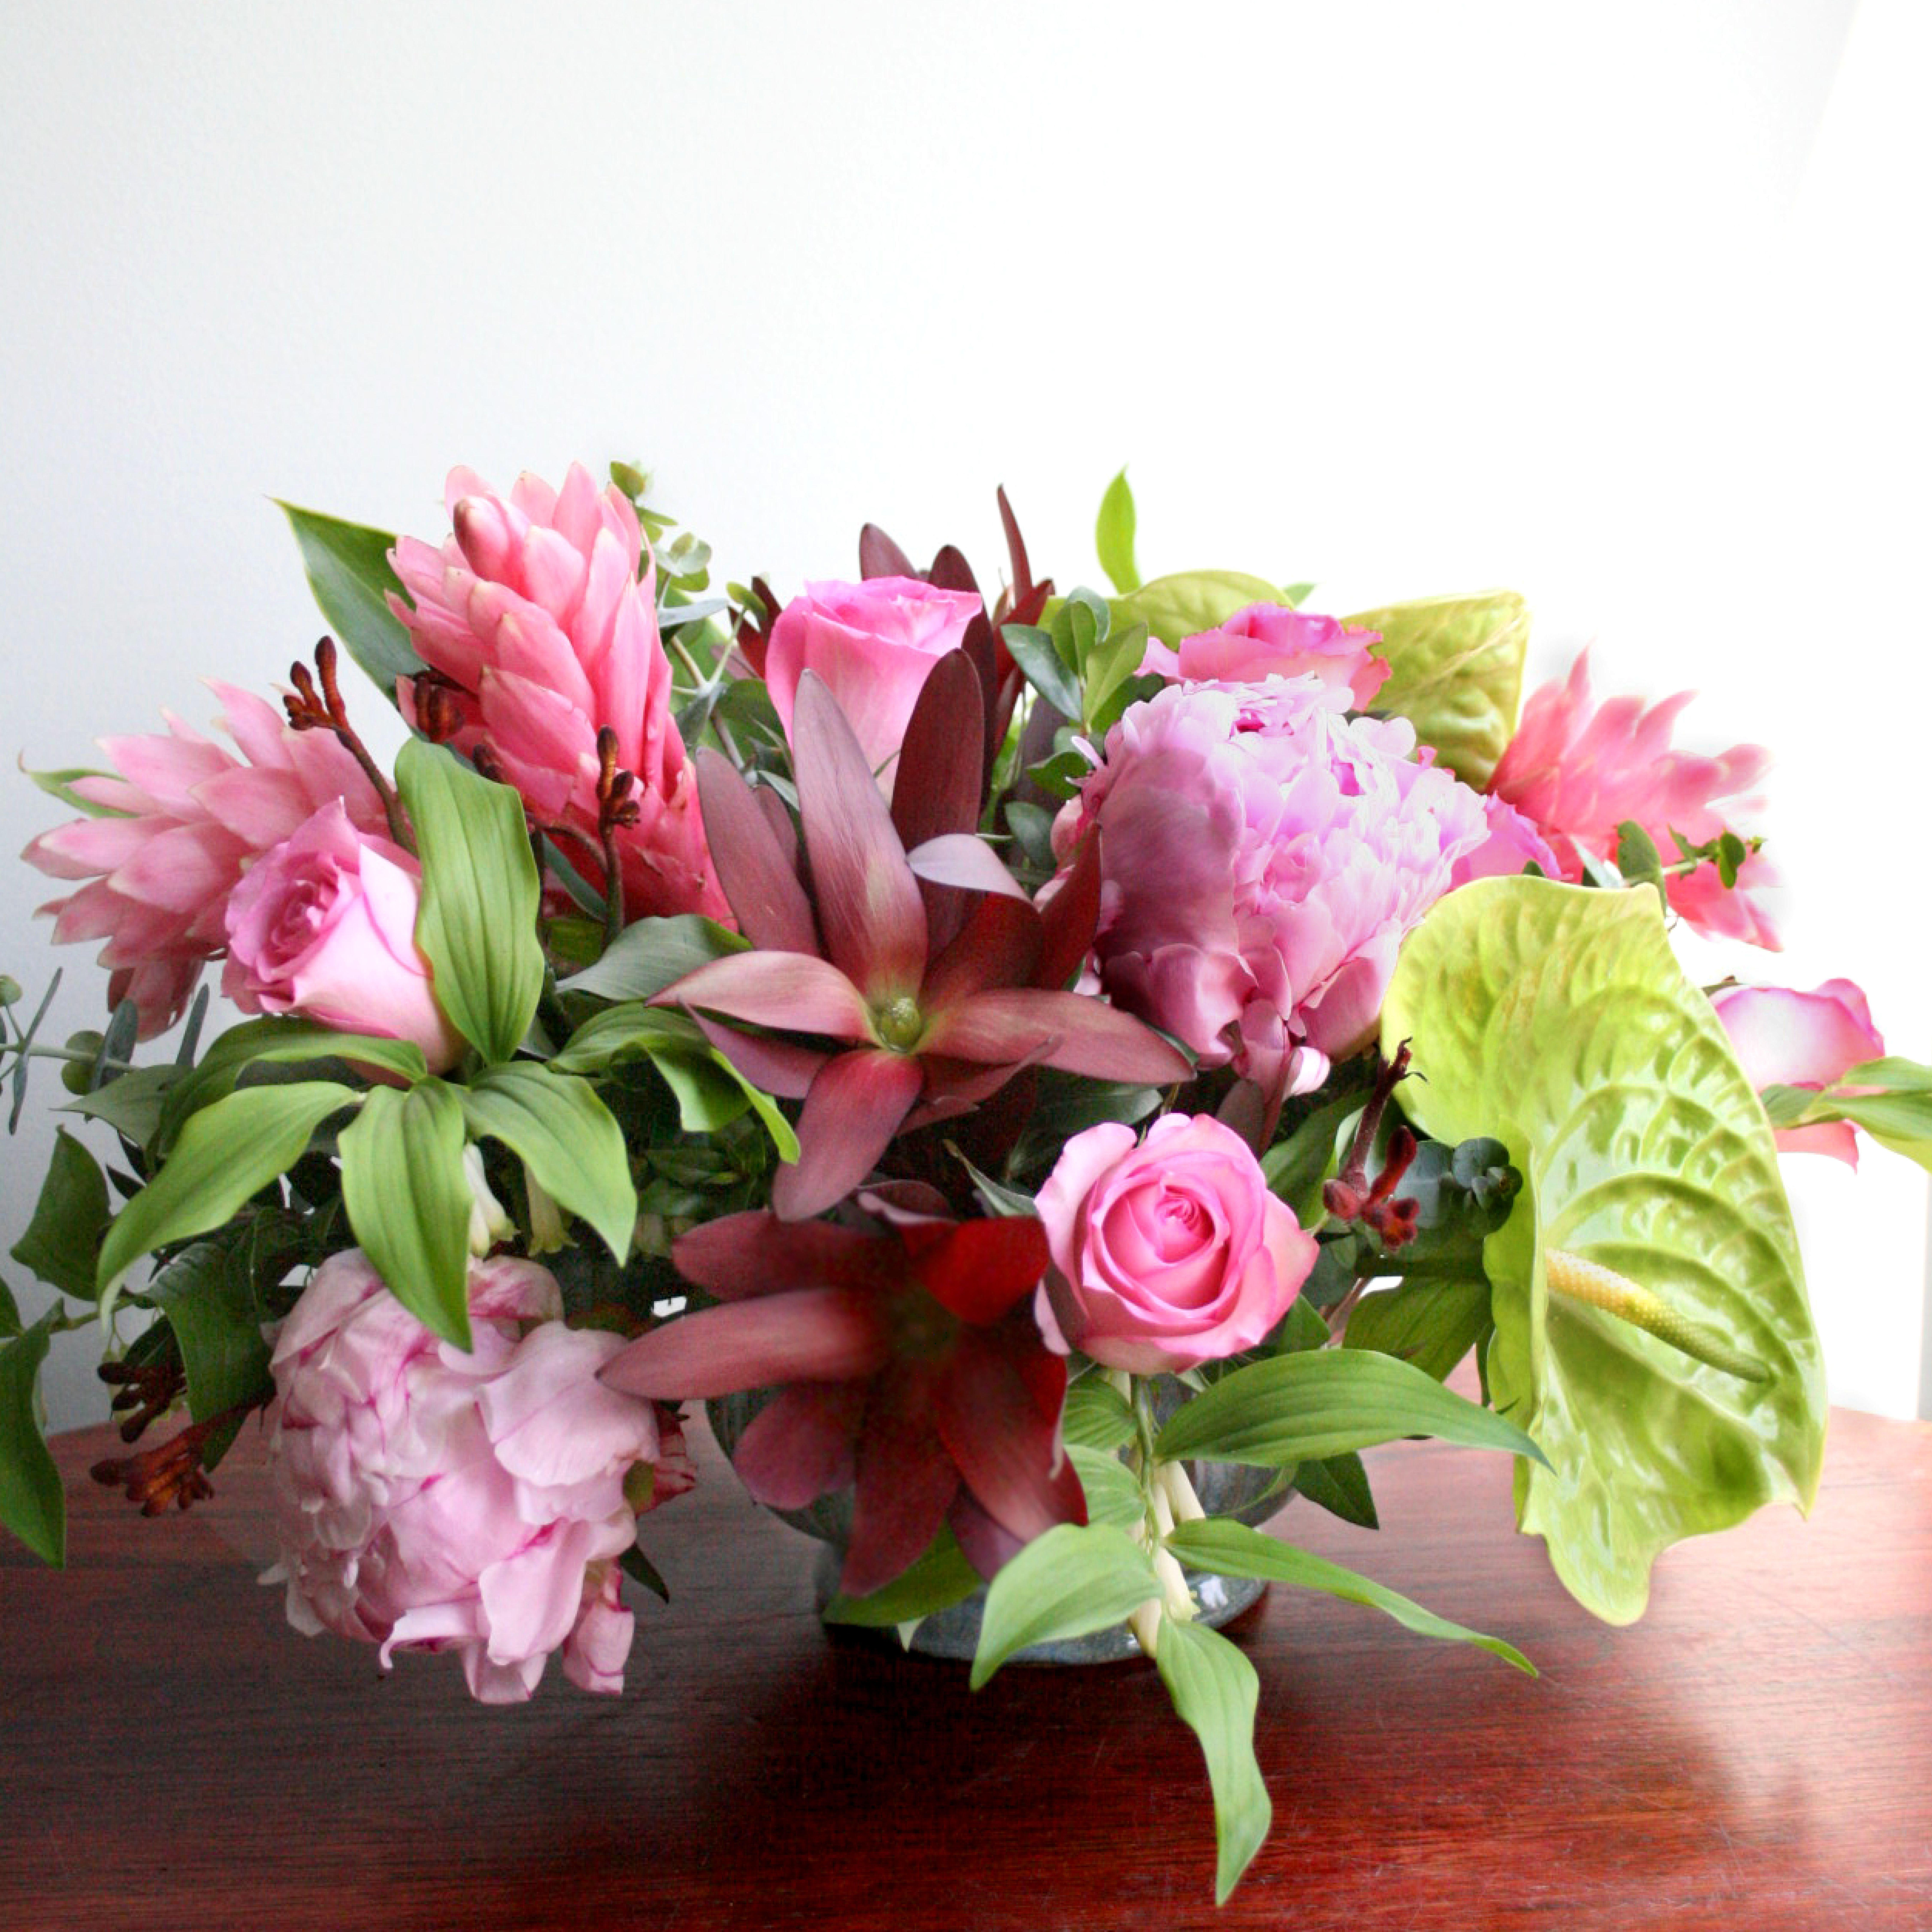 Tropical Arrangement Freytag's Florist Austin, TX